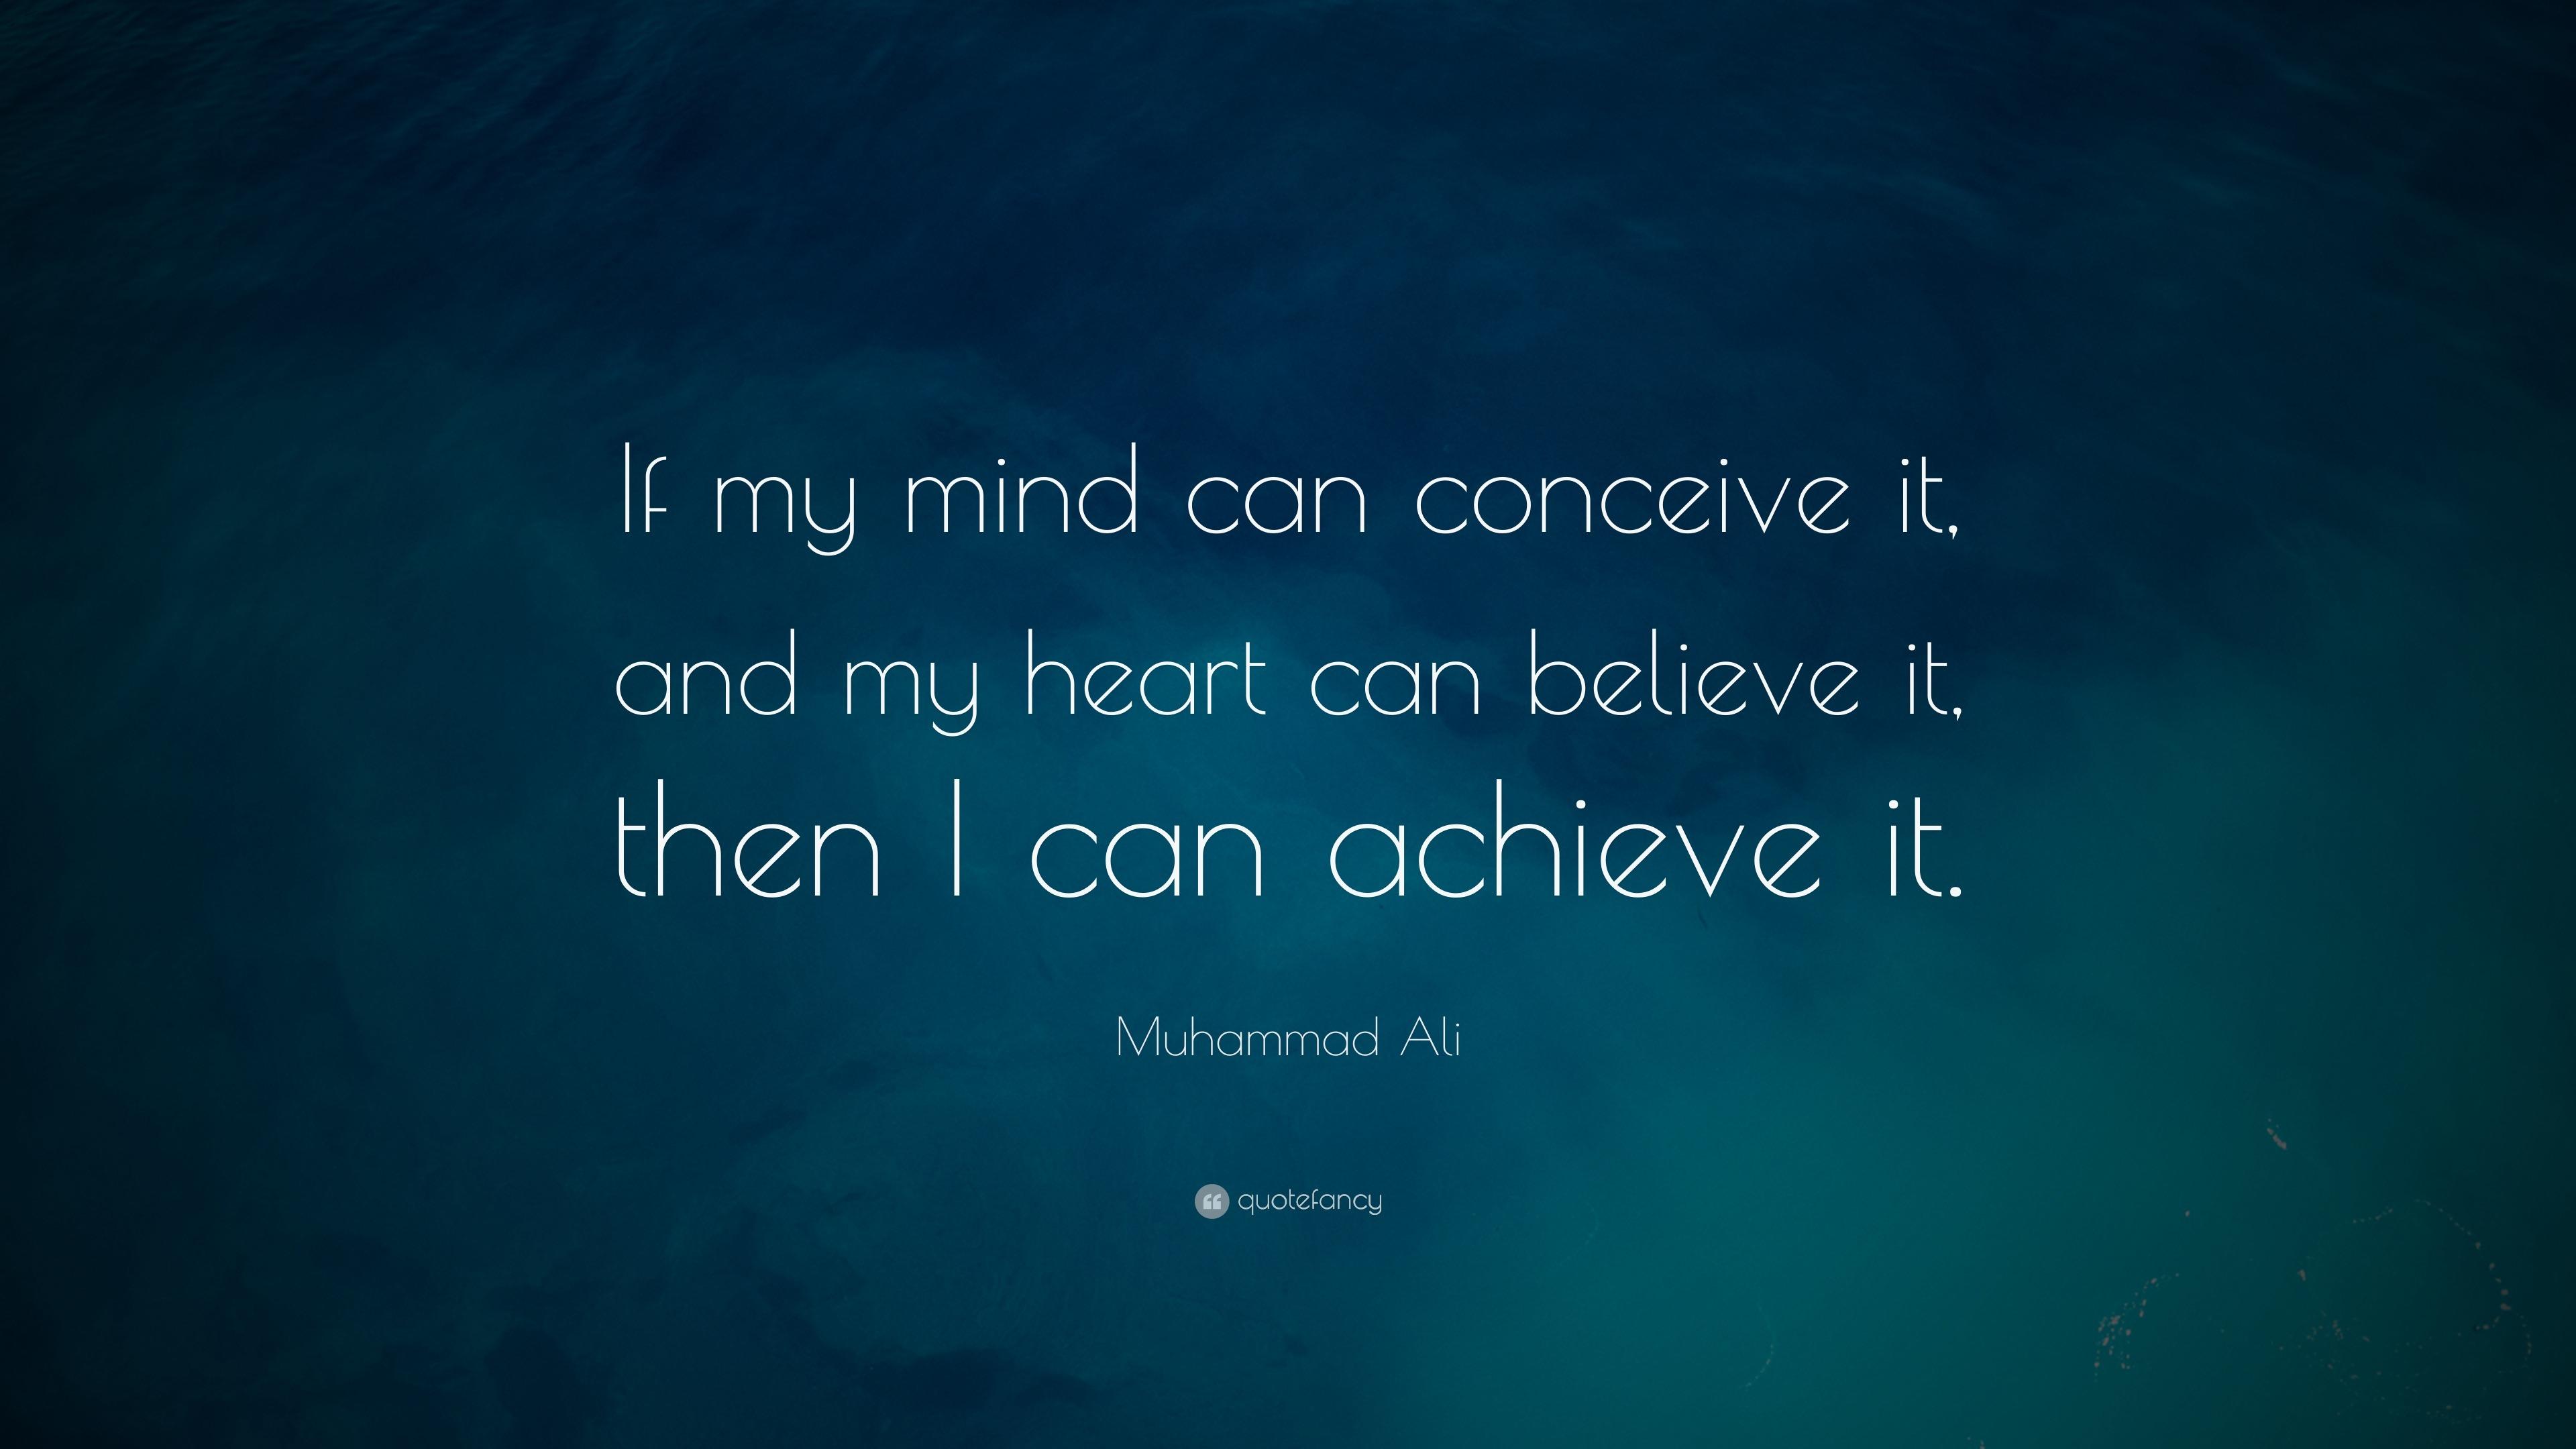 Muhammad Ali If My Mind Can Achieve It